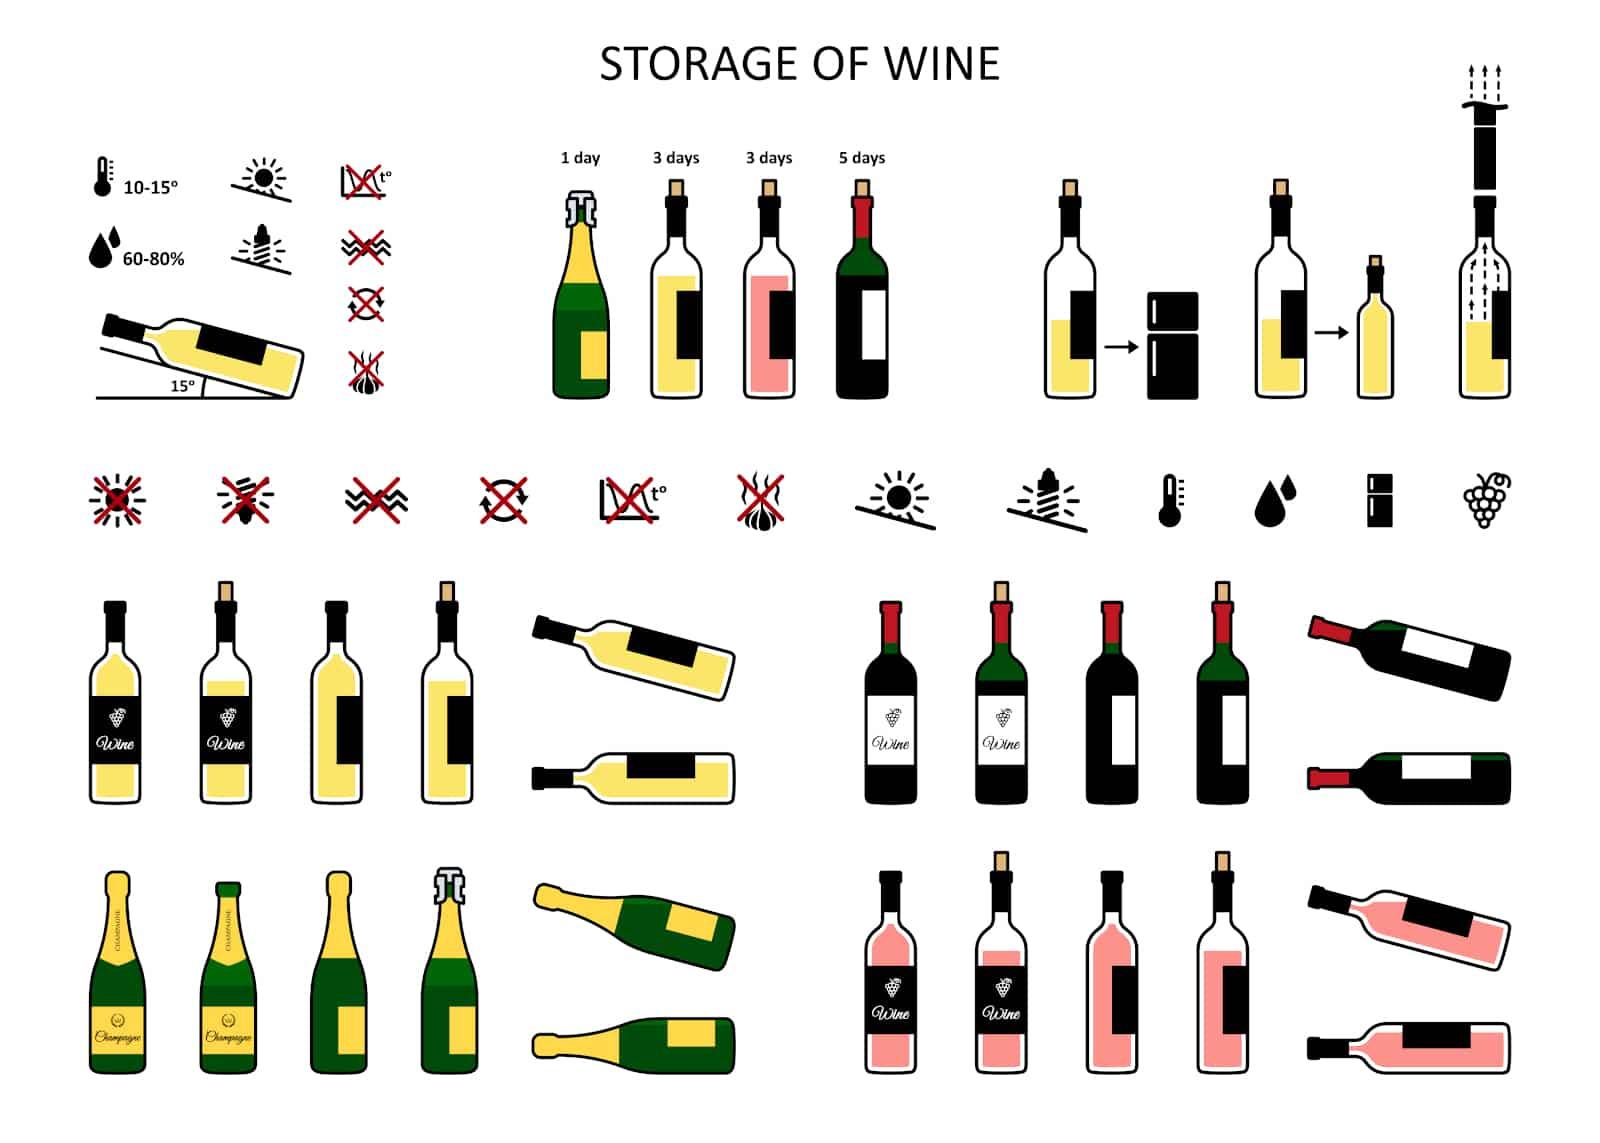 Wine Storage Infographic